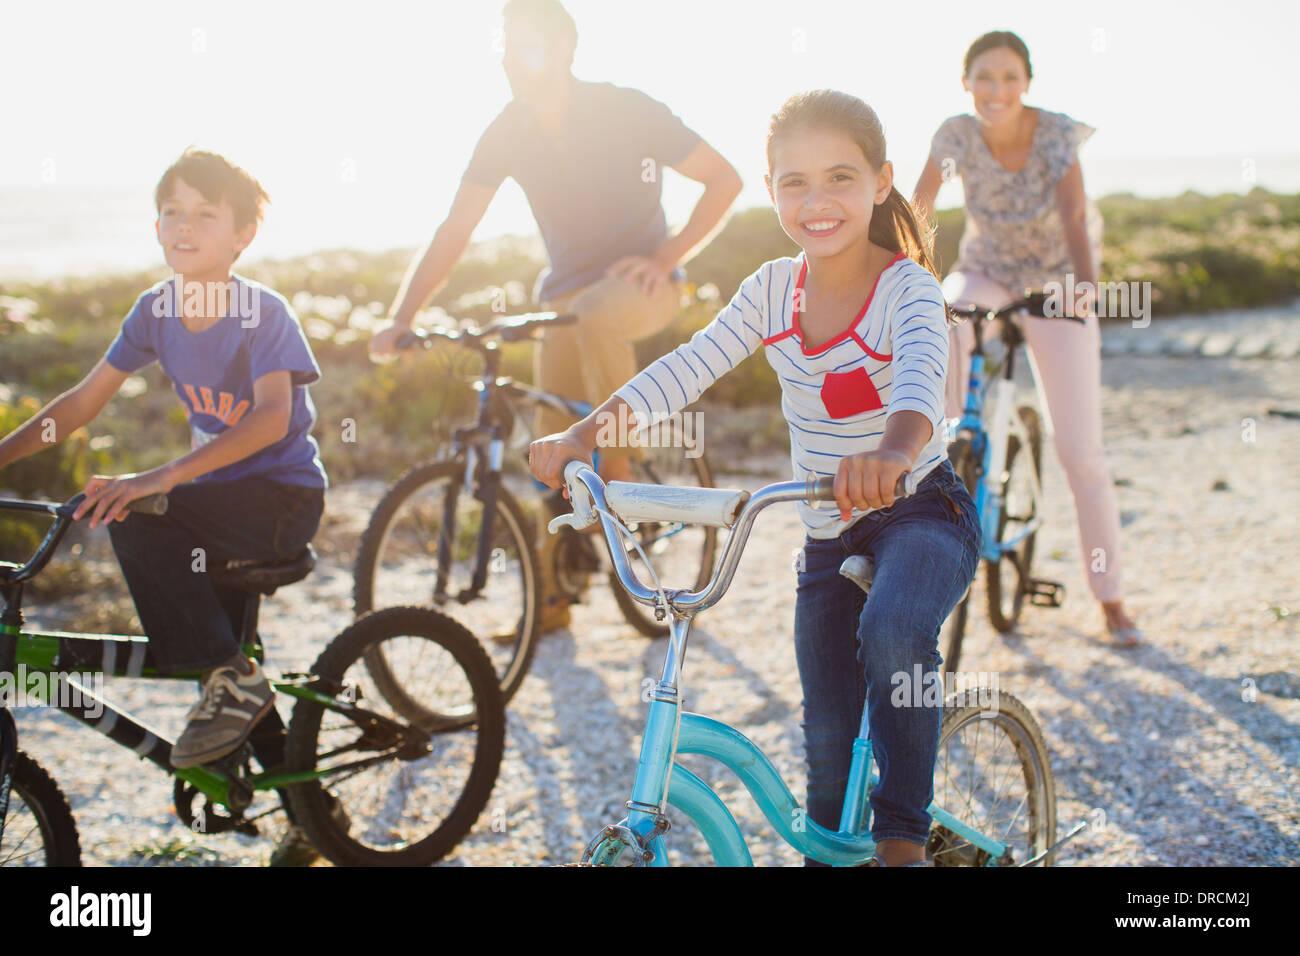 Family riding bicycles on sunny beach Photo Stock